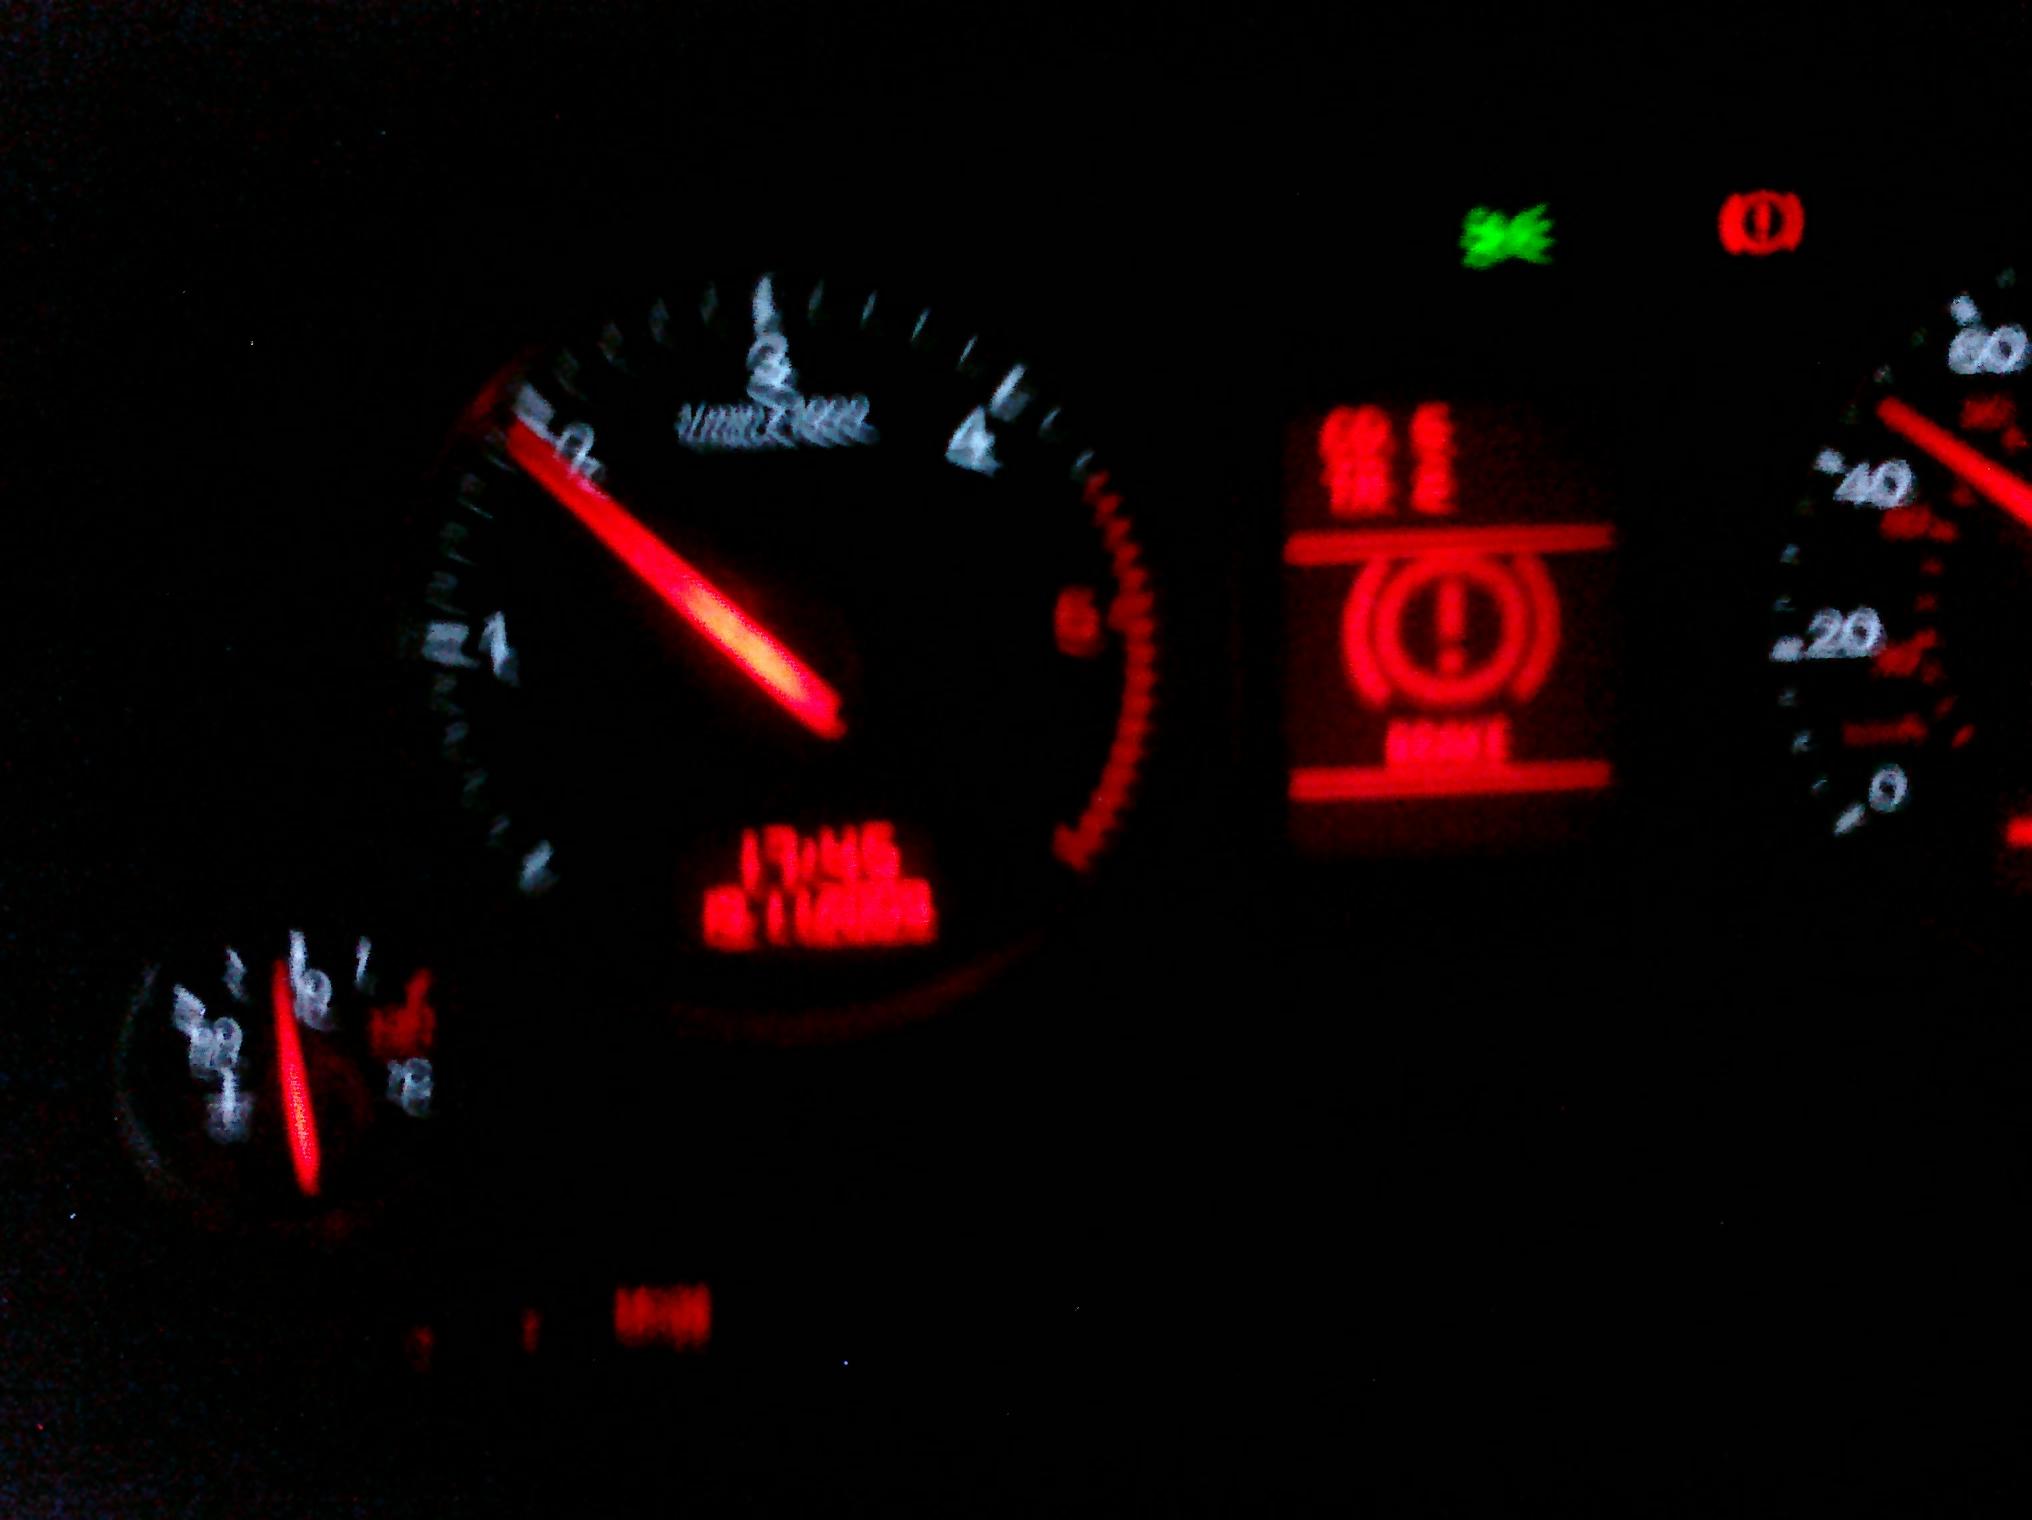 2001 Audi Tt Dashboard Symbols The Audi Car